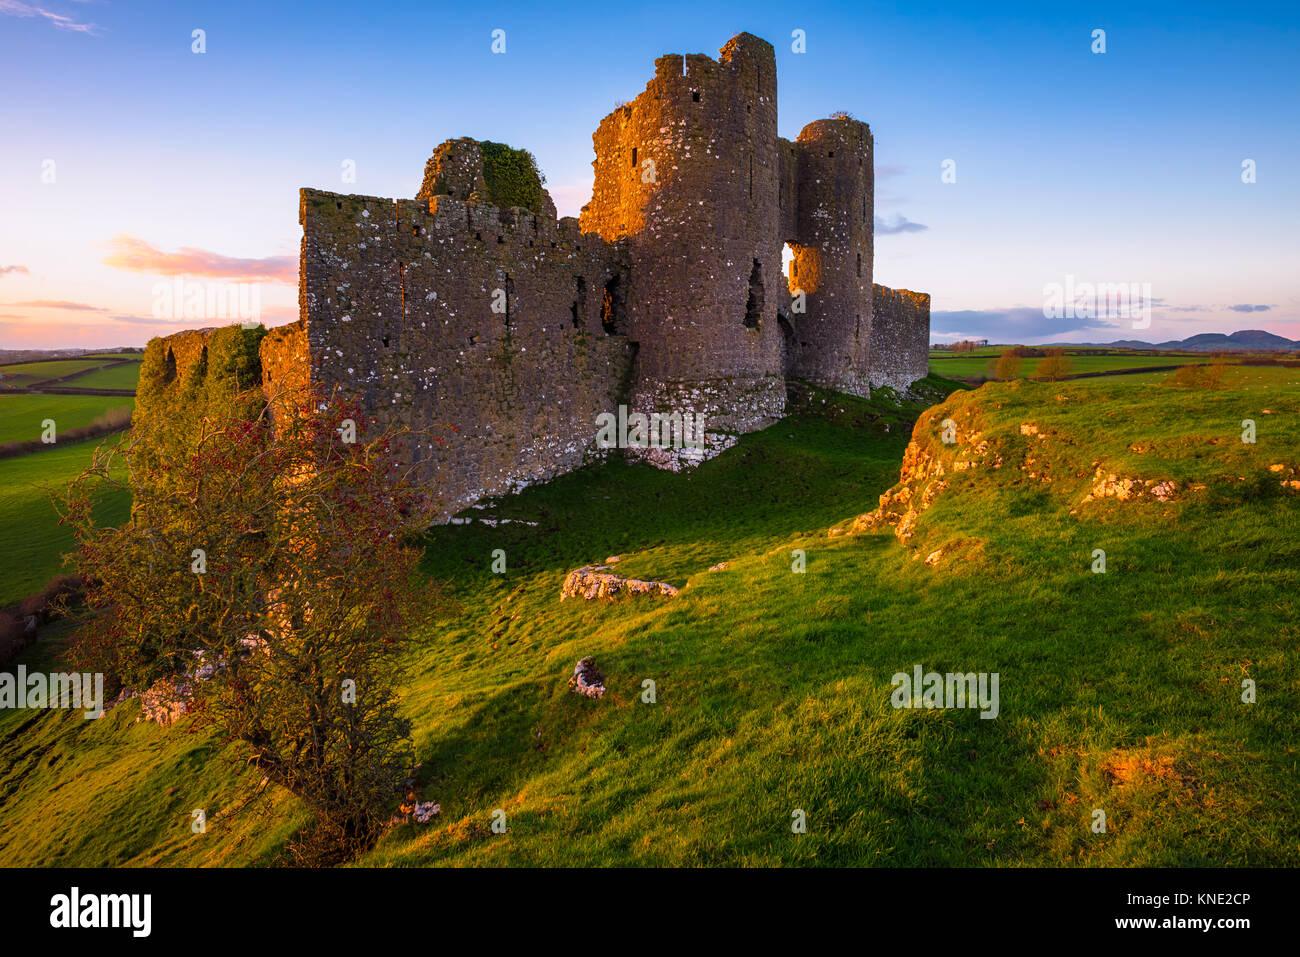 Castle Roche in Ireland - Stock Image